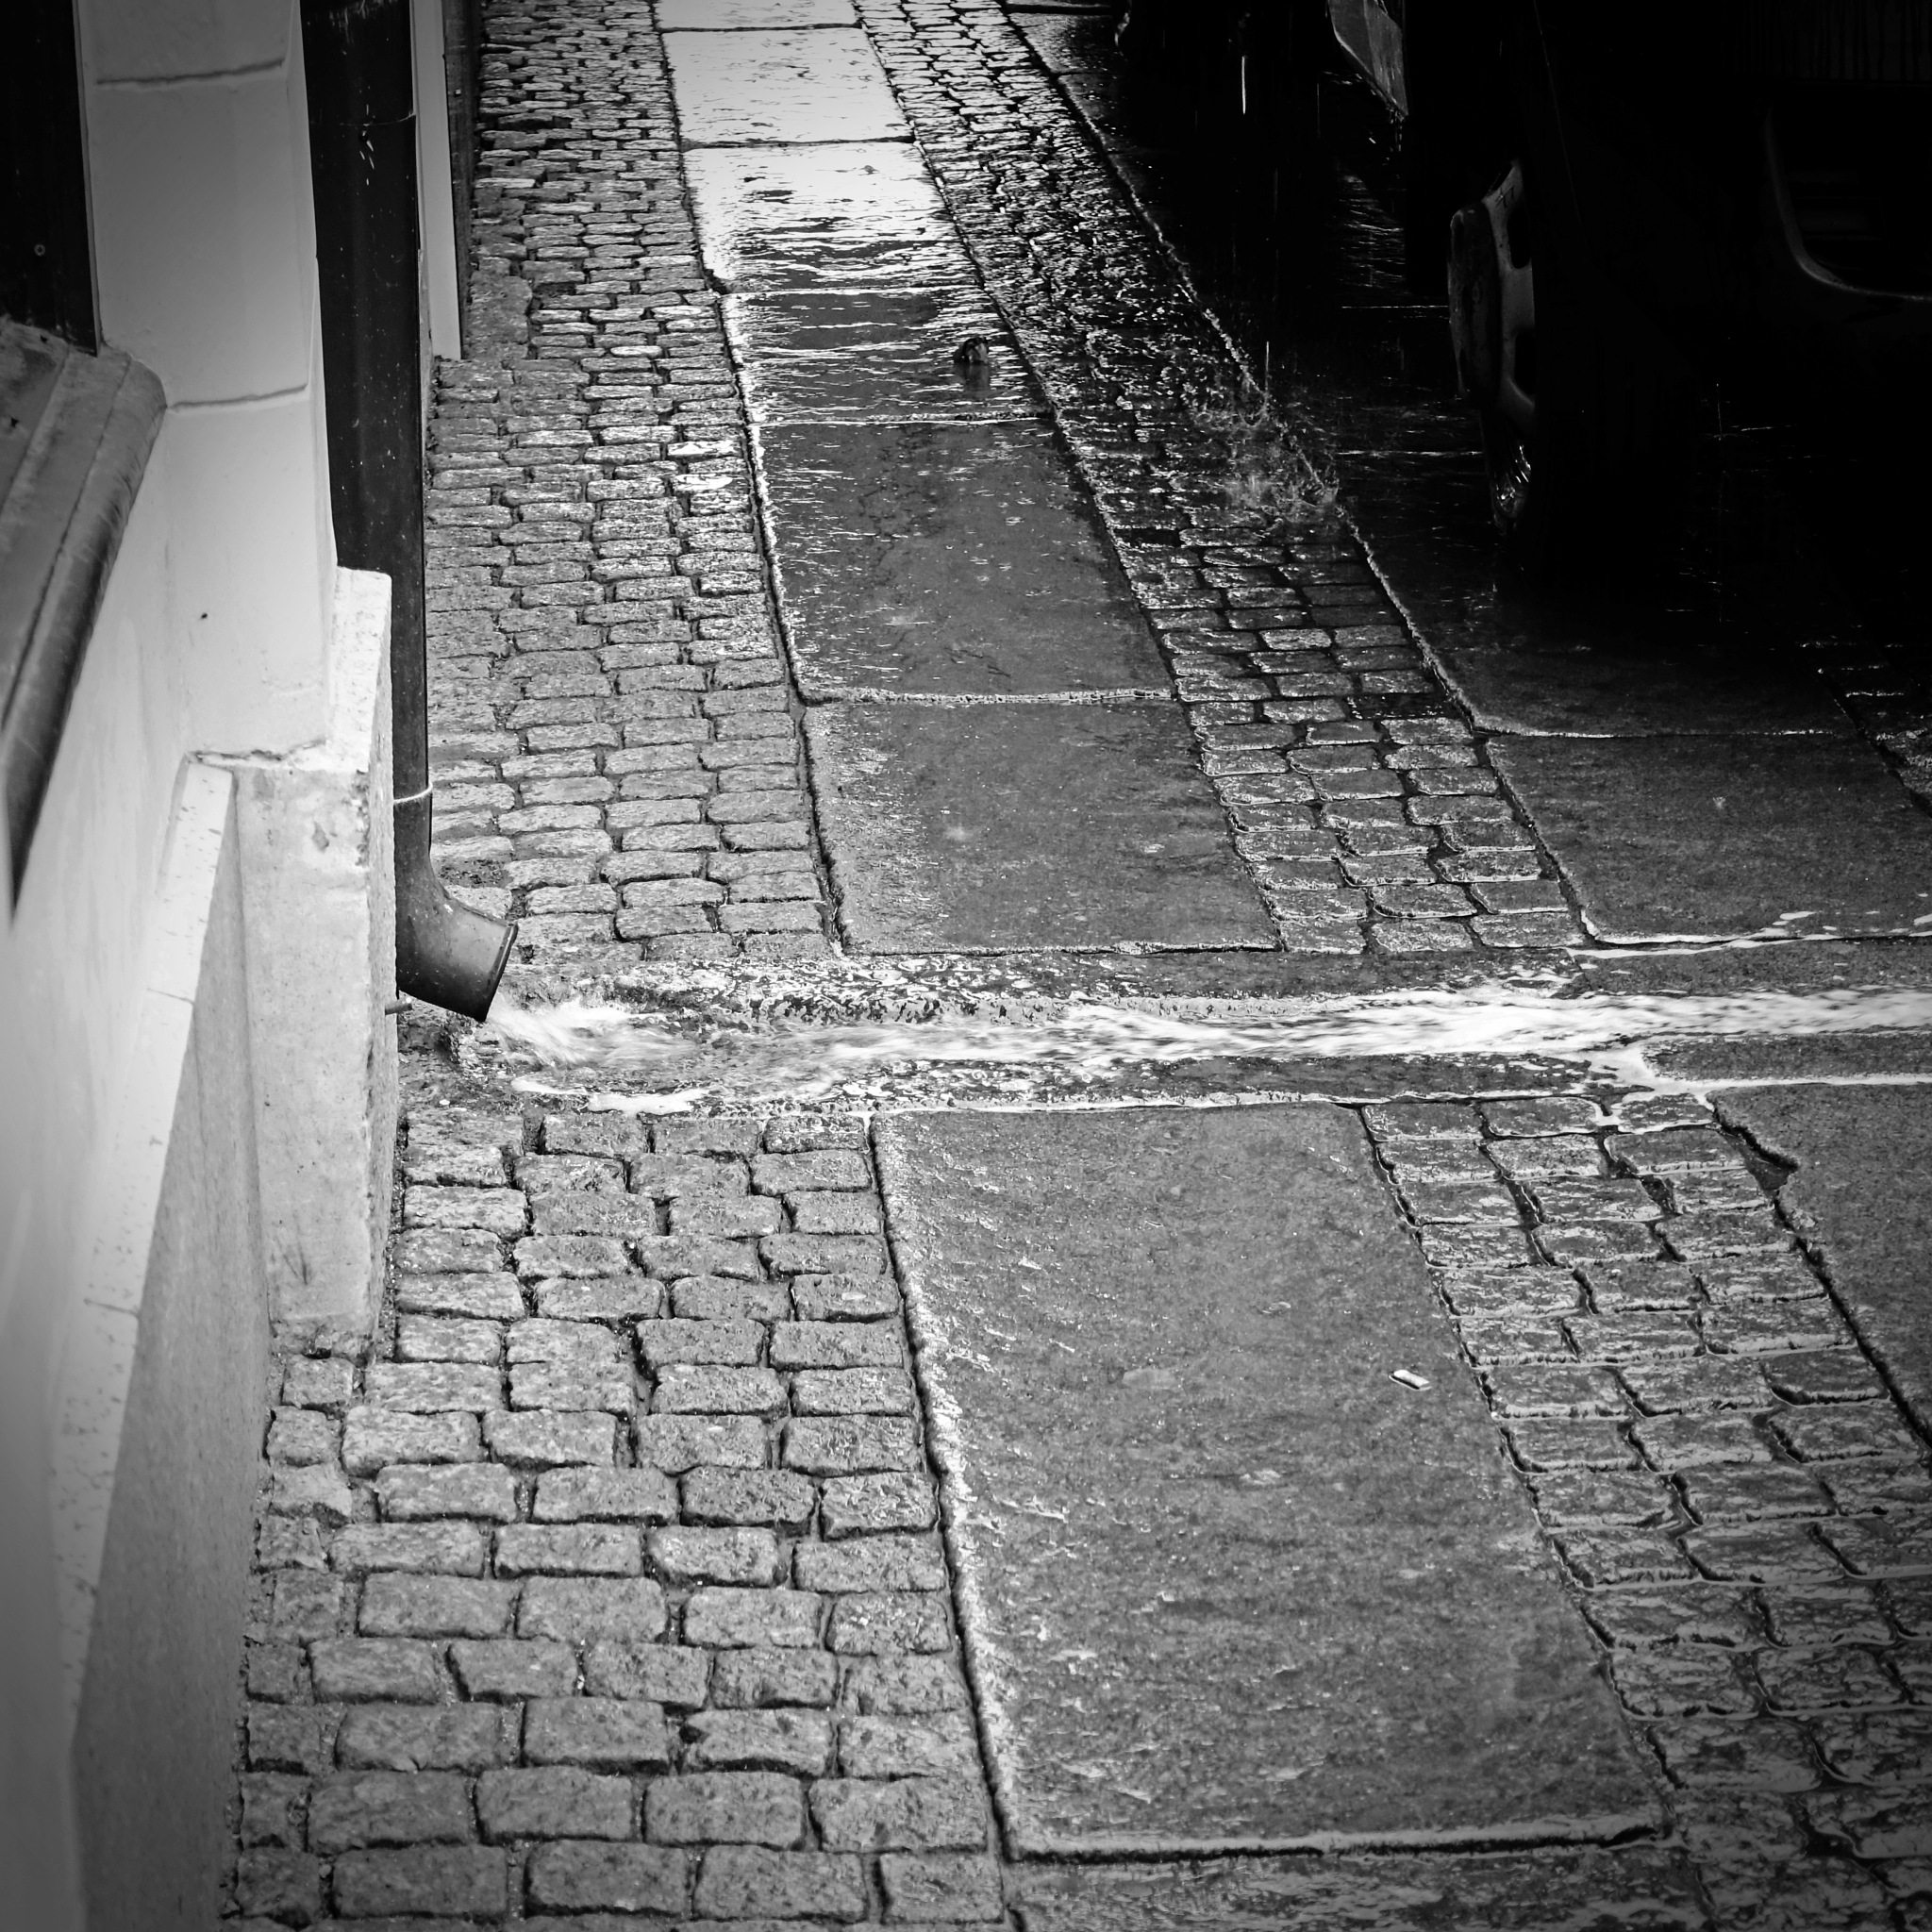 Rain by Bo G Svensson